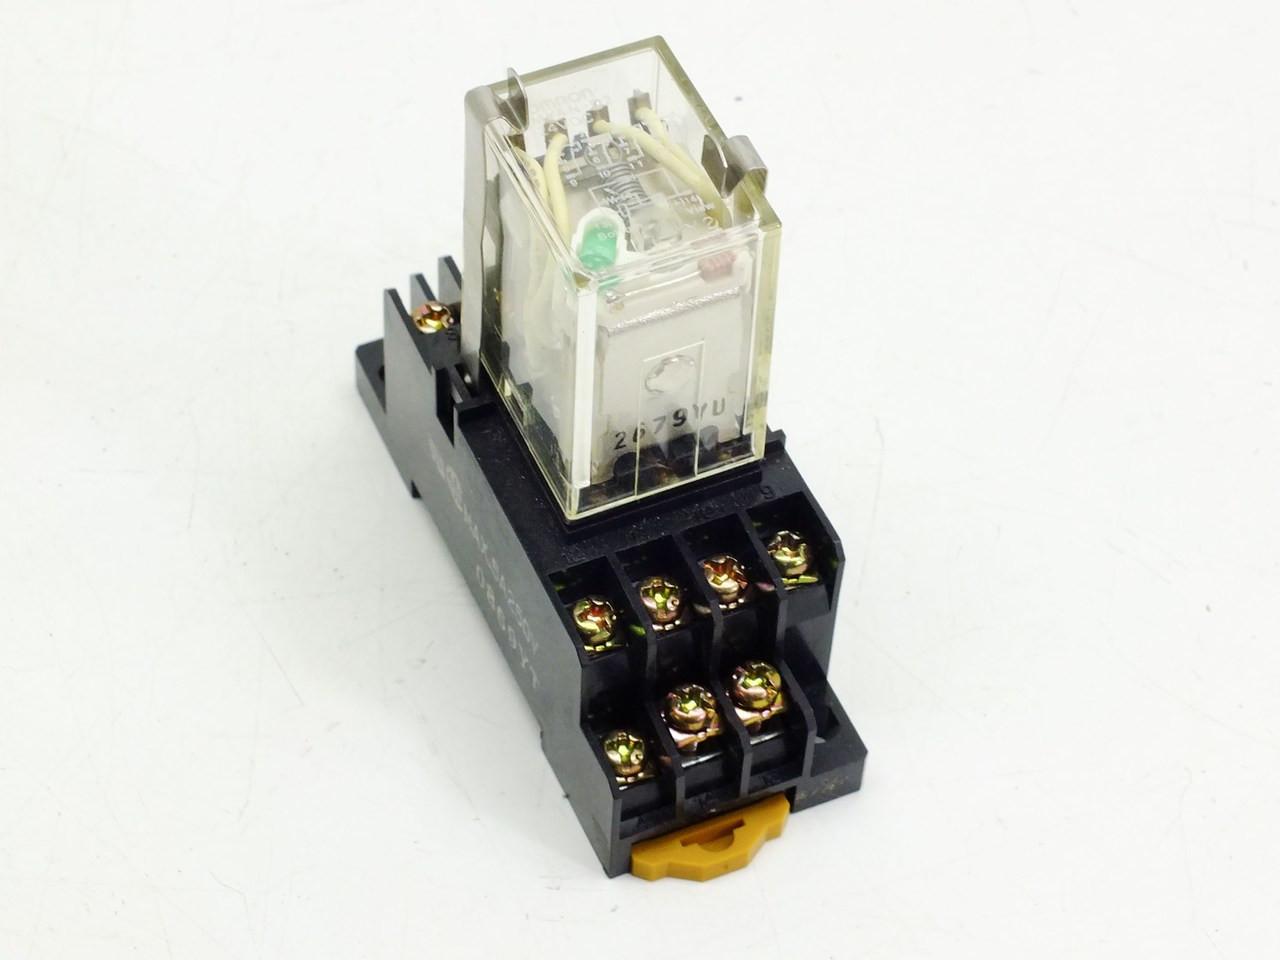 omron miniature power relay my4n d2 24vdc 5amp  [ 1280 x 960 Pixel ]